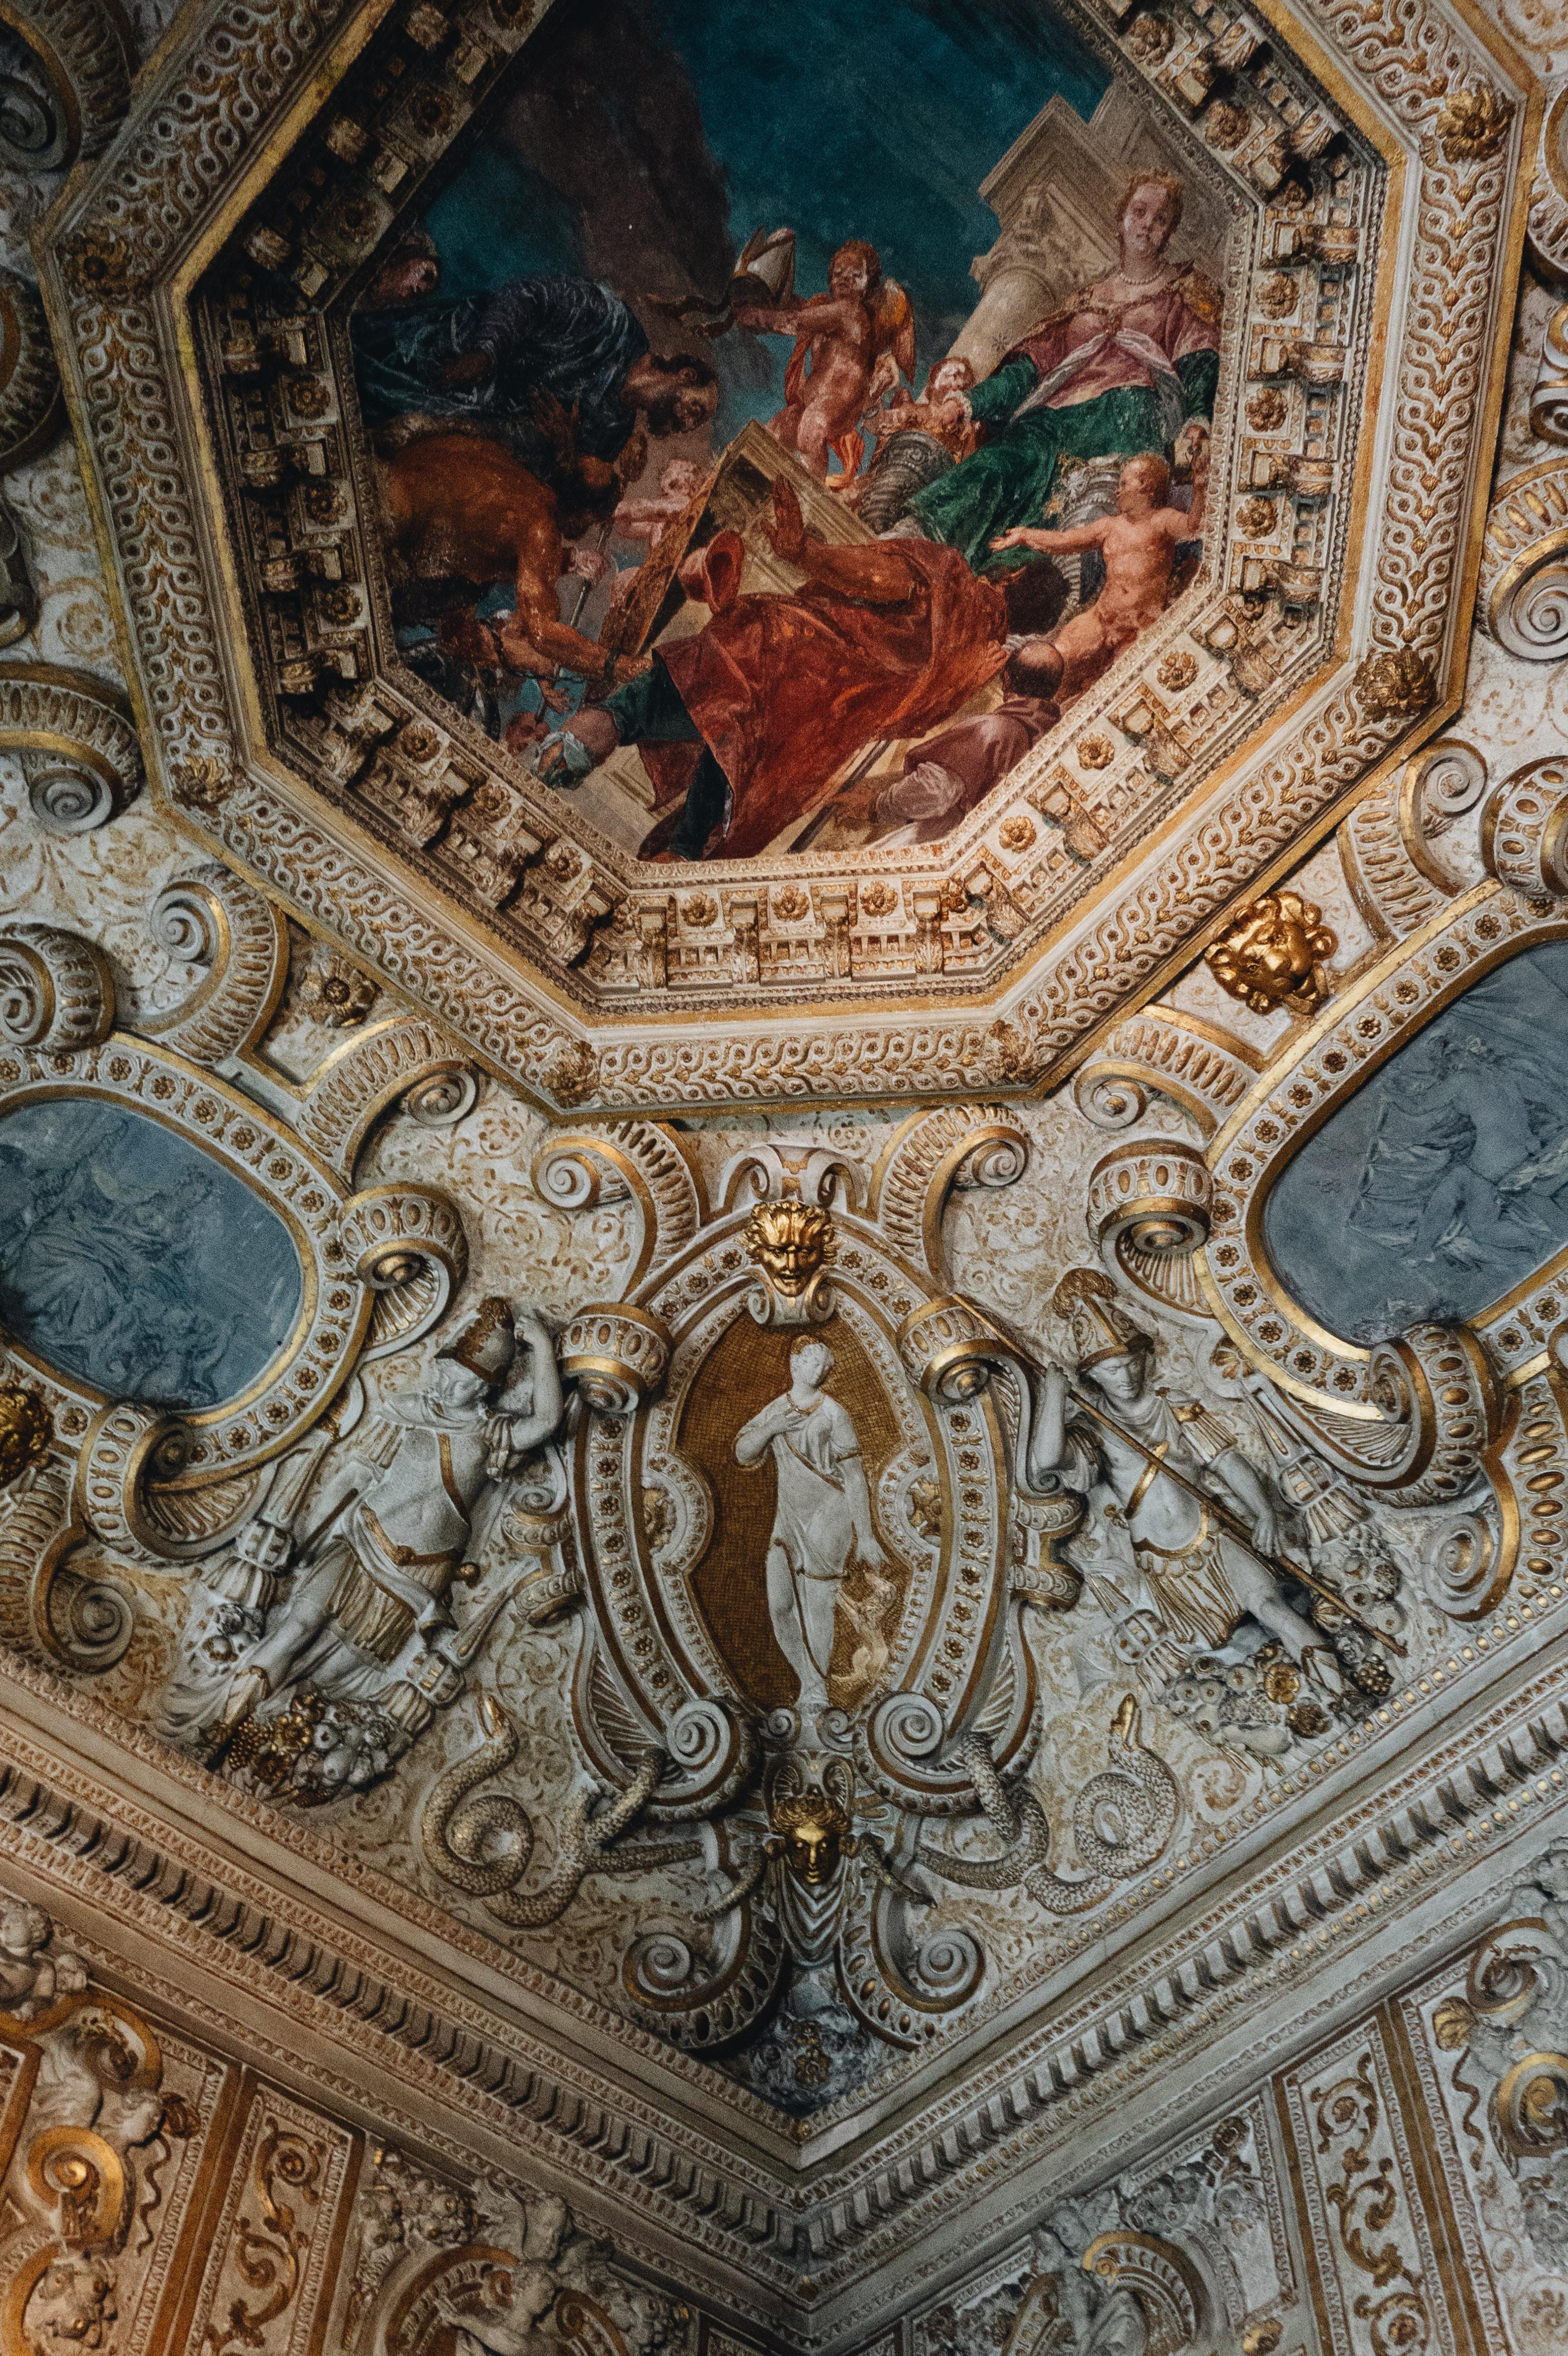 sculpture plafond période classique